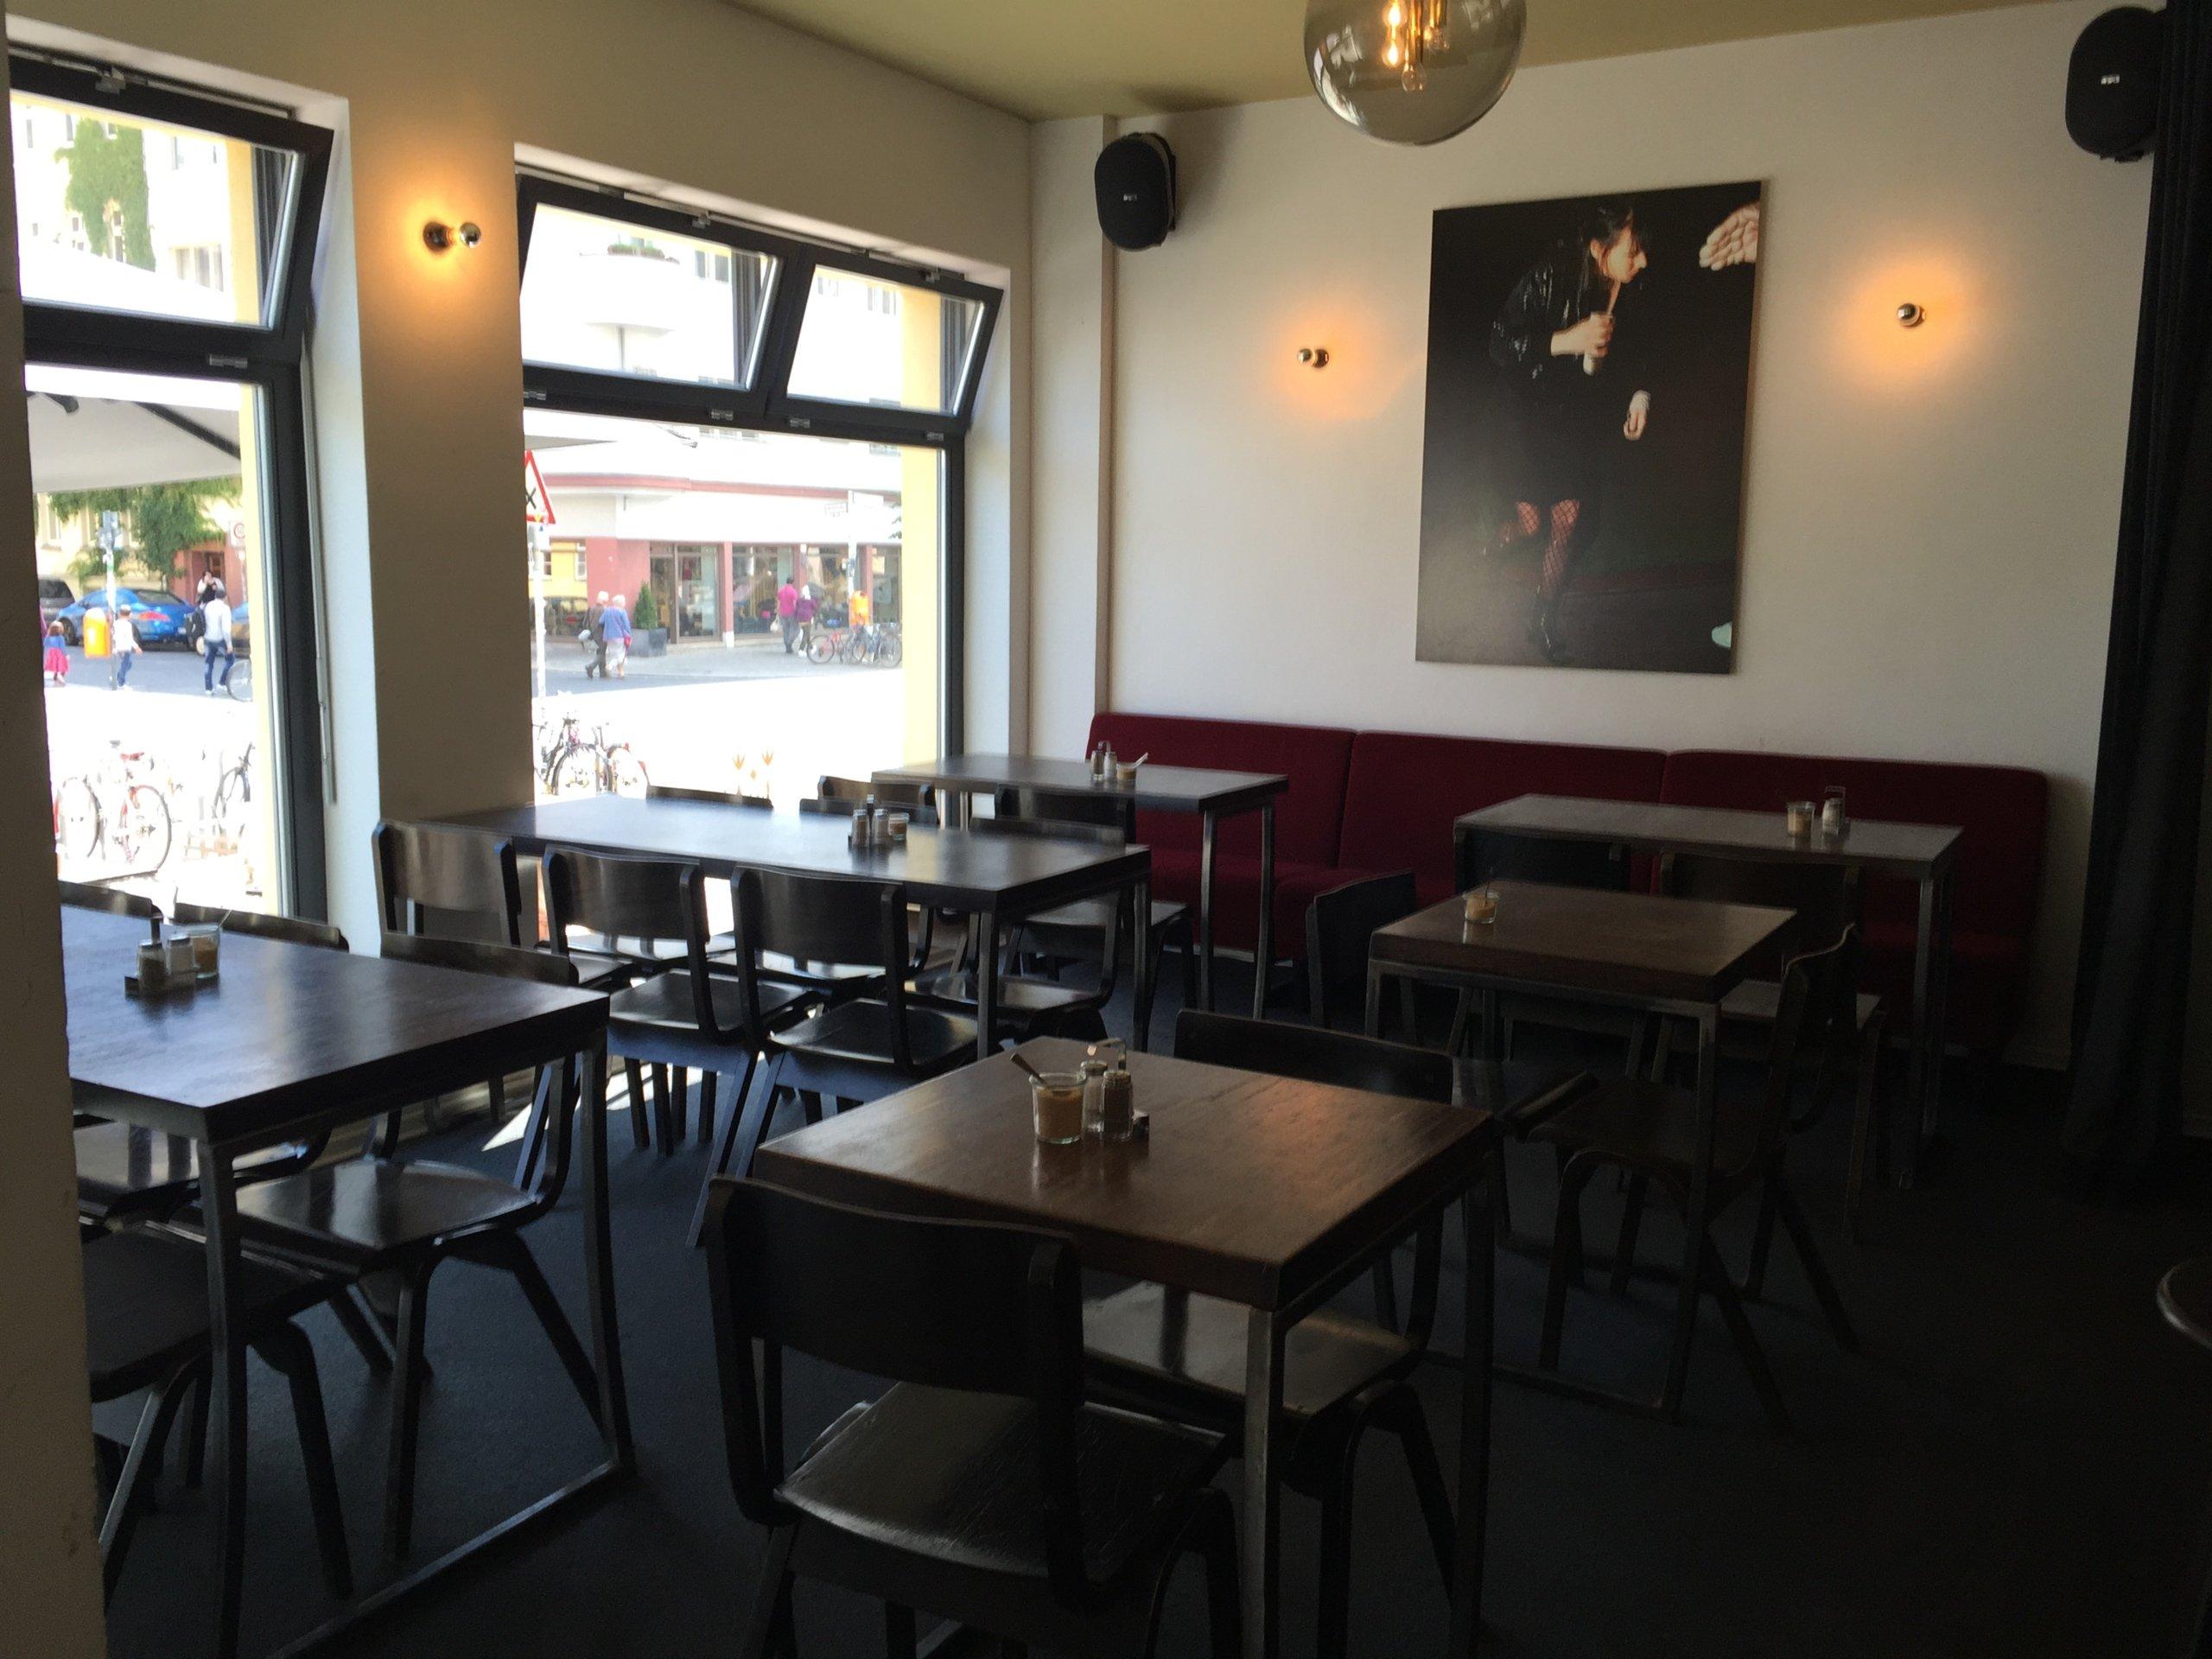 sauers cafe ffnungszeiten rosa luxemburg stra e in. Black Bedroom Furniture Sets. Home Design Ideas